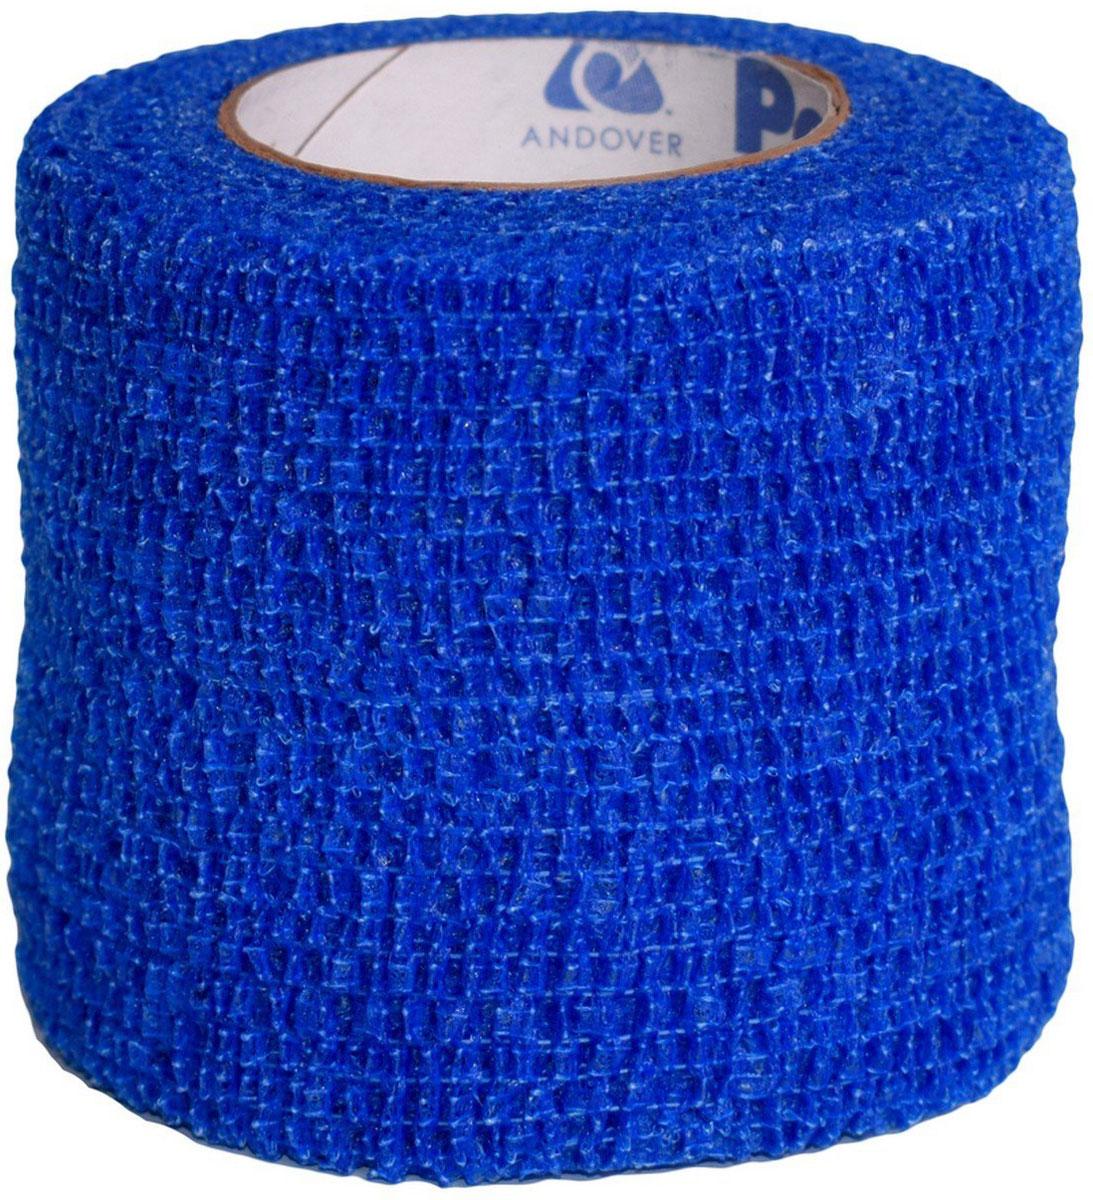 Фото - Бандаж Andover PetFlex Микс 5 см х 4,5 м (1 шт) aravia бинт для обертывания organic тканый 10 см х 10 м 1 шт